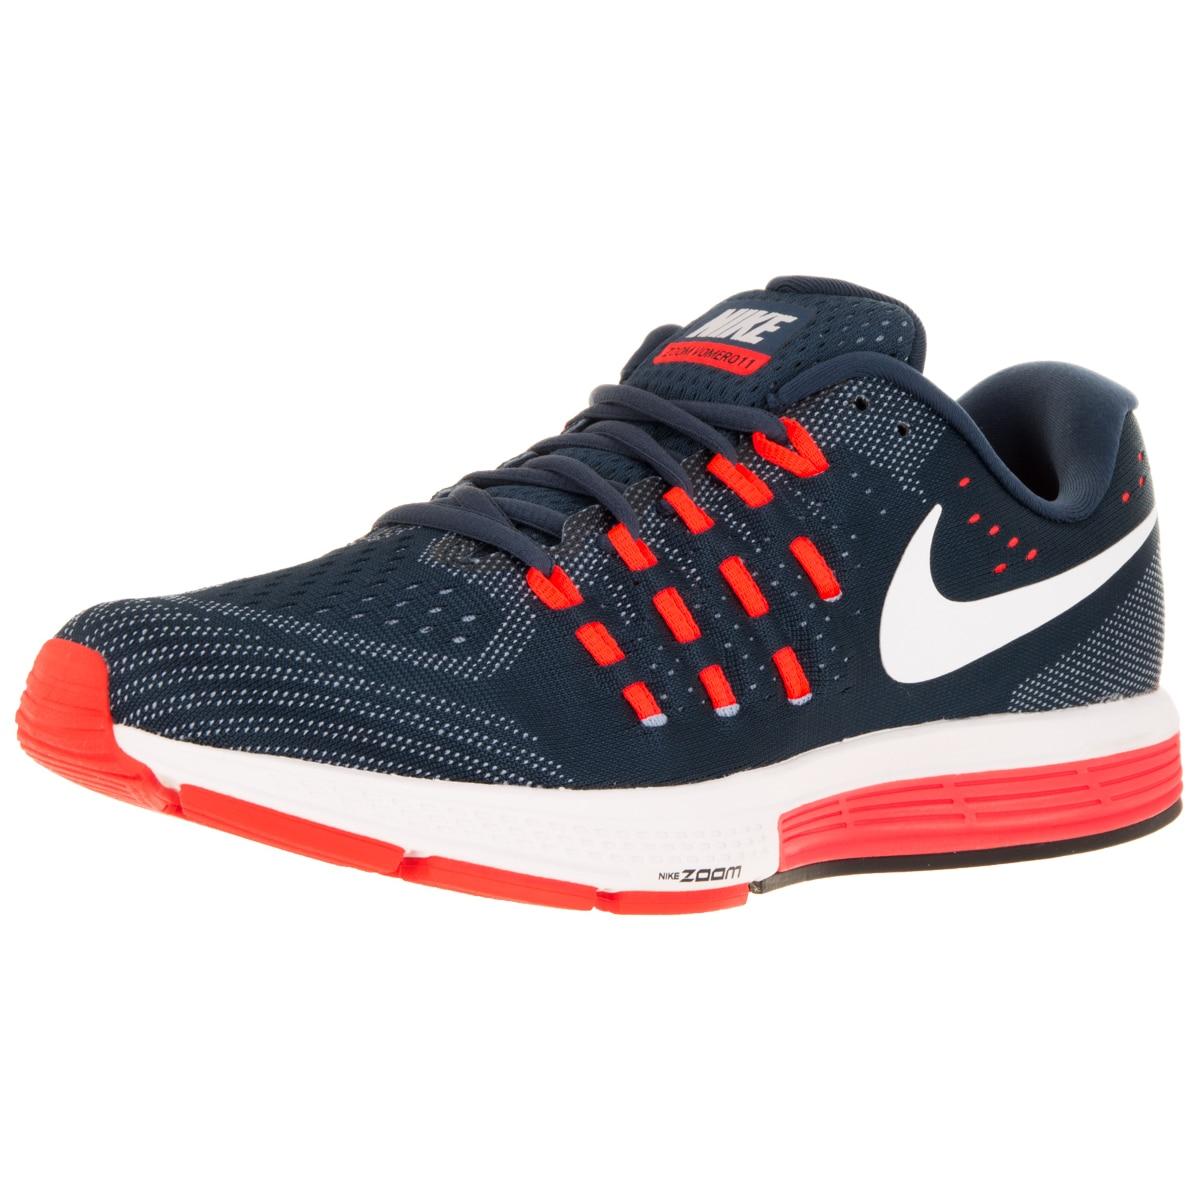 Nike Men's Air Zoom Vomero 11 Blue/White/Bl /T Crms Runni...